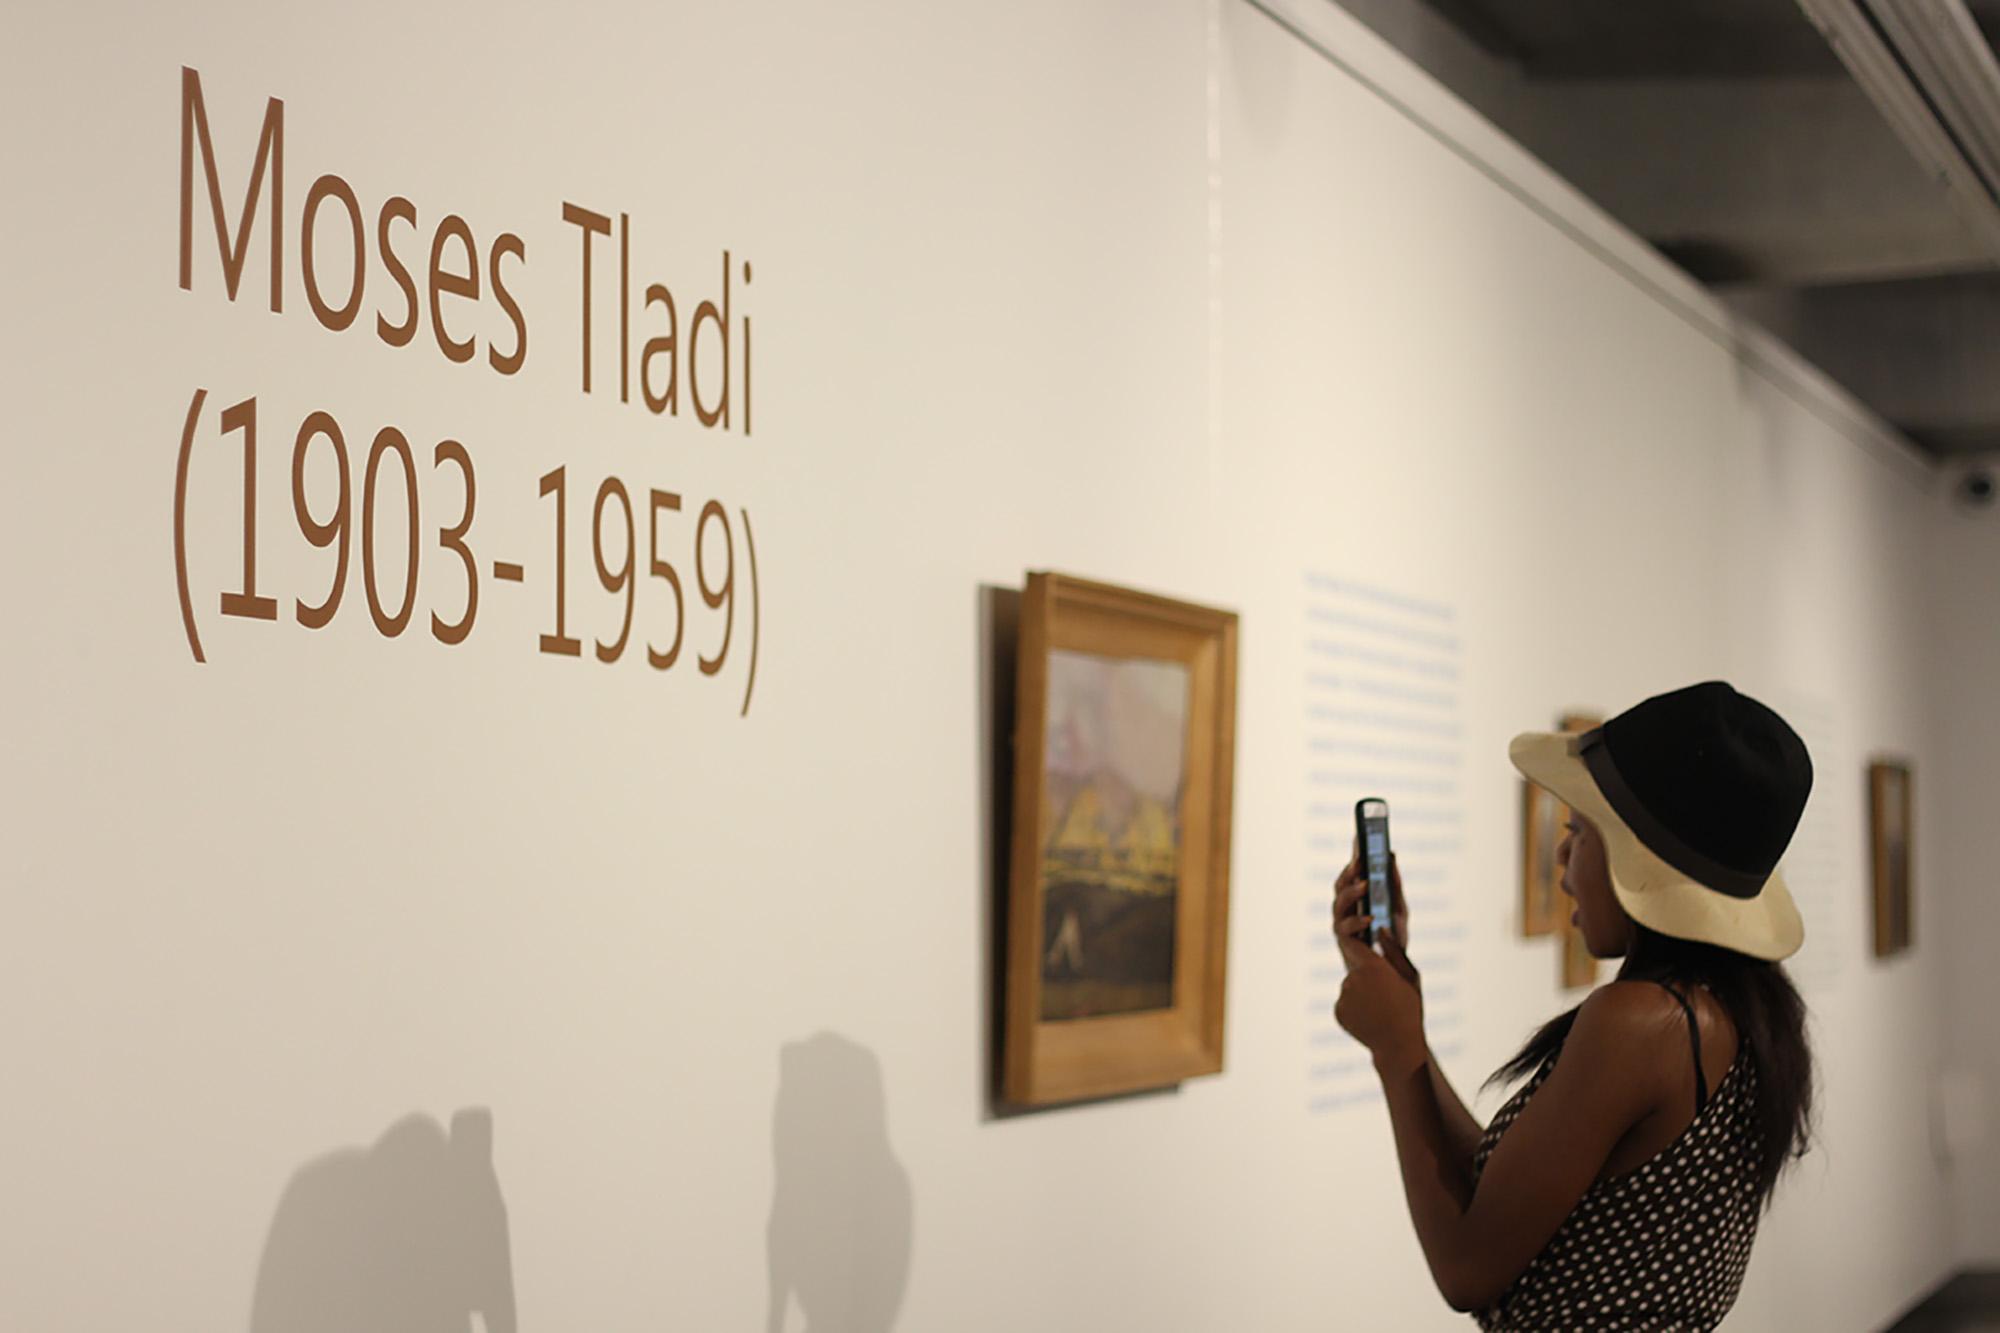 A special exhibition: Moses Tladi (1903-1959)